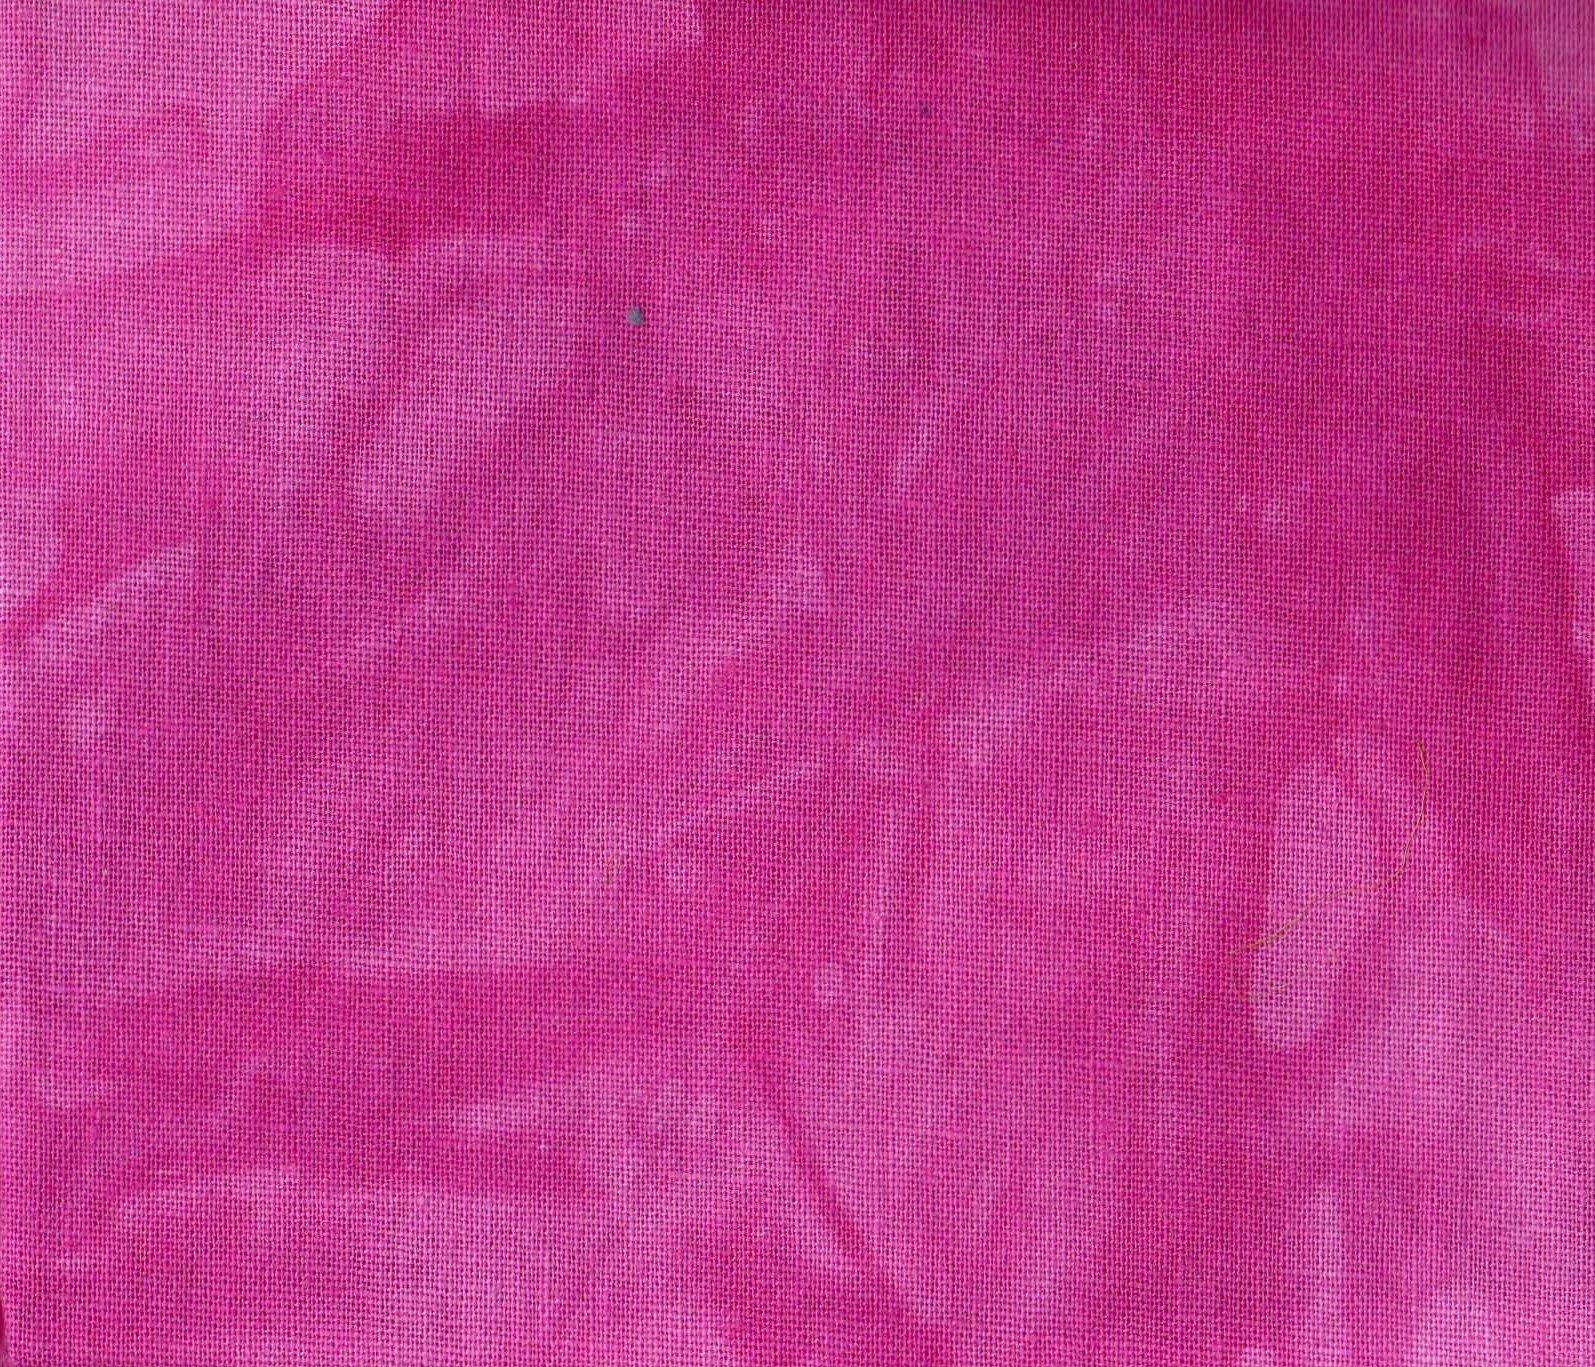 Amethyst Hand-Dyed Linen